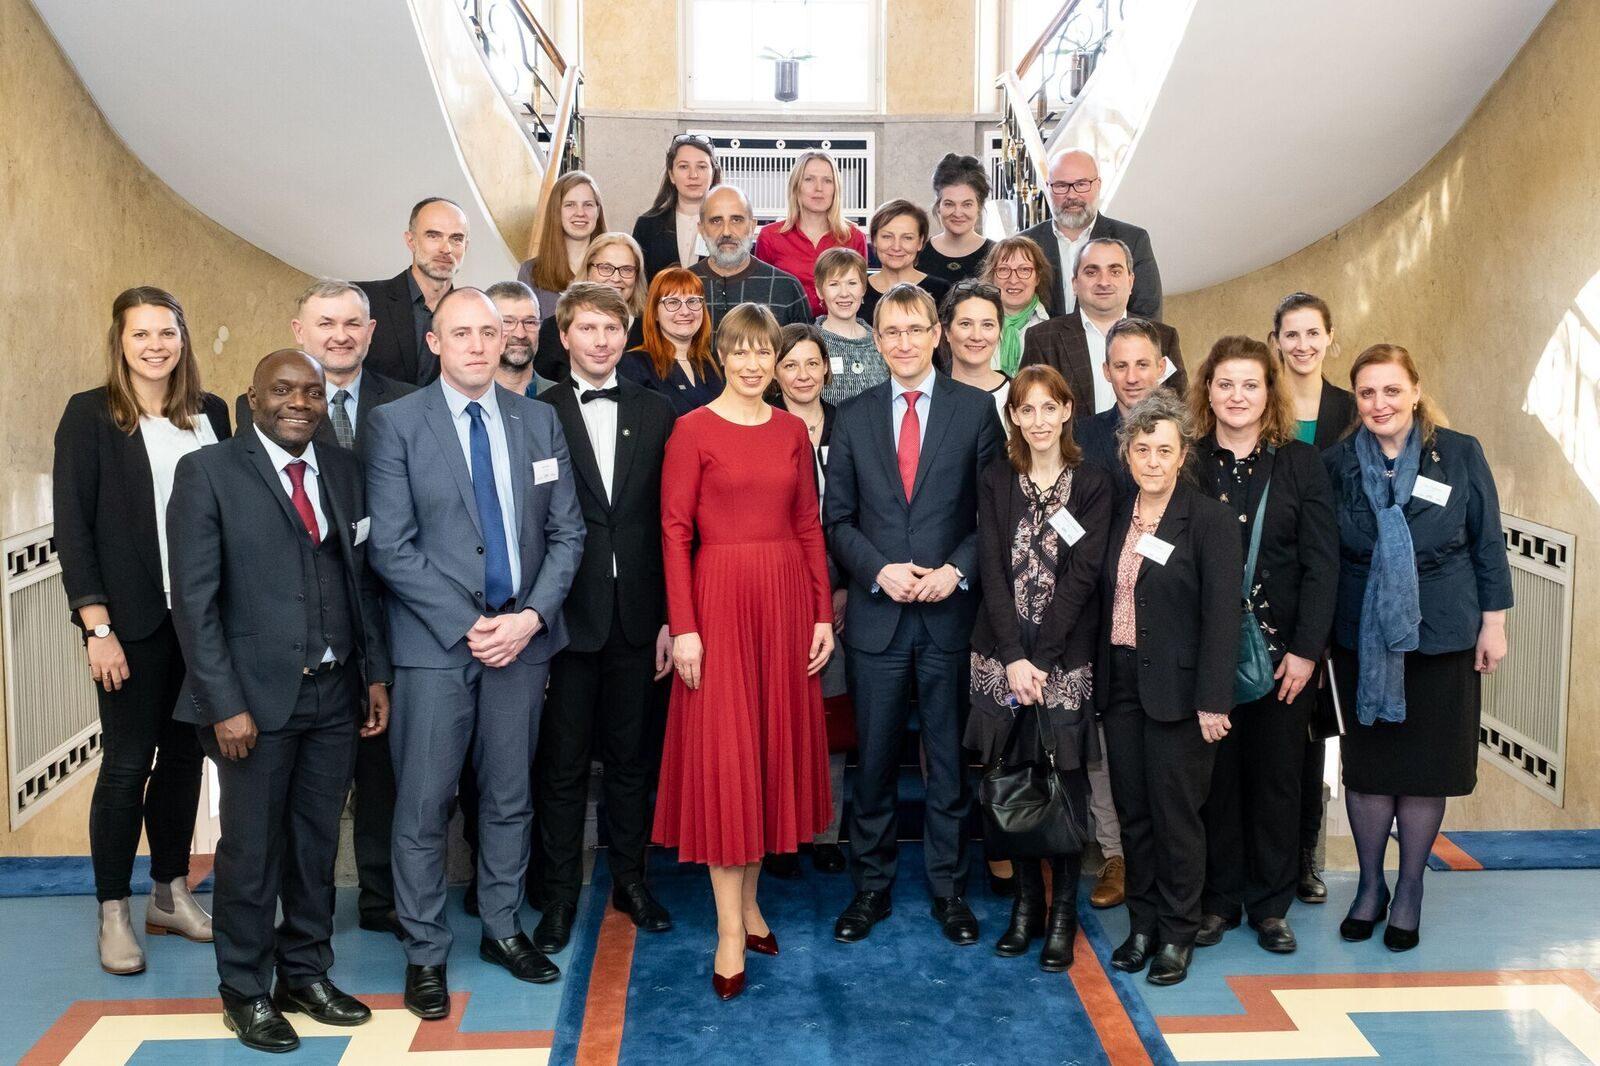 Recepción de la Red EUSTORY por la presidenta estonia Kaljulaid   Foto: Aron Ur